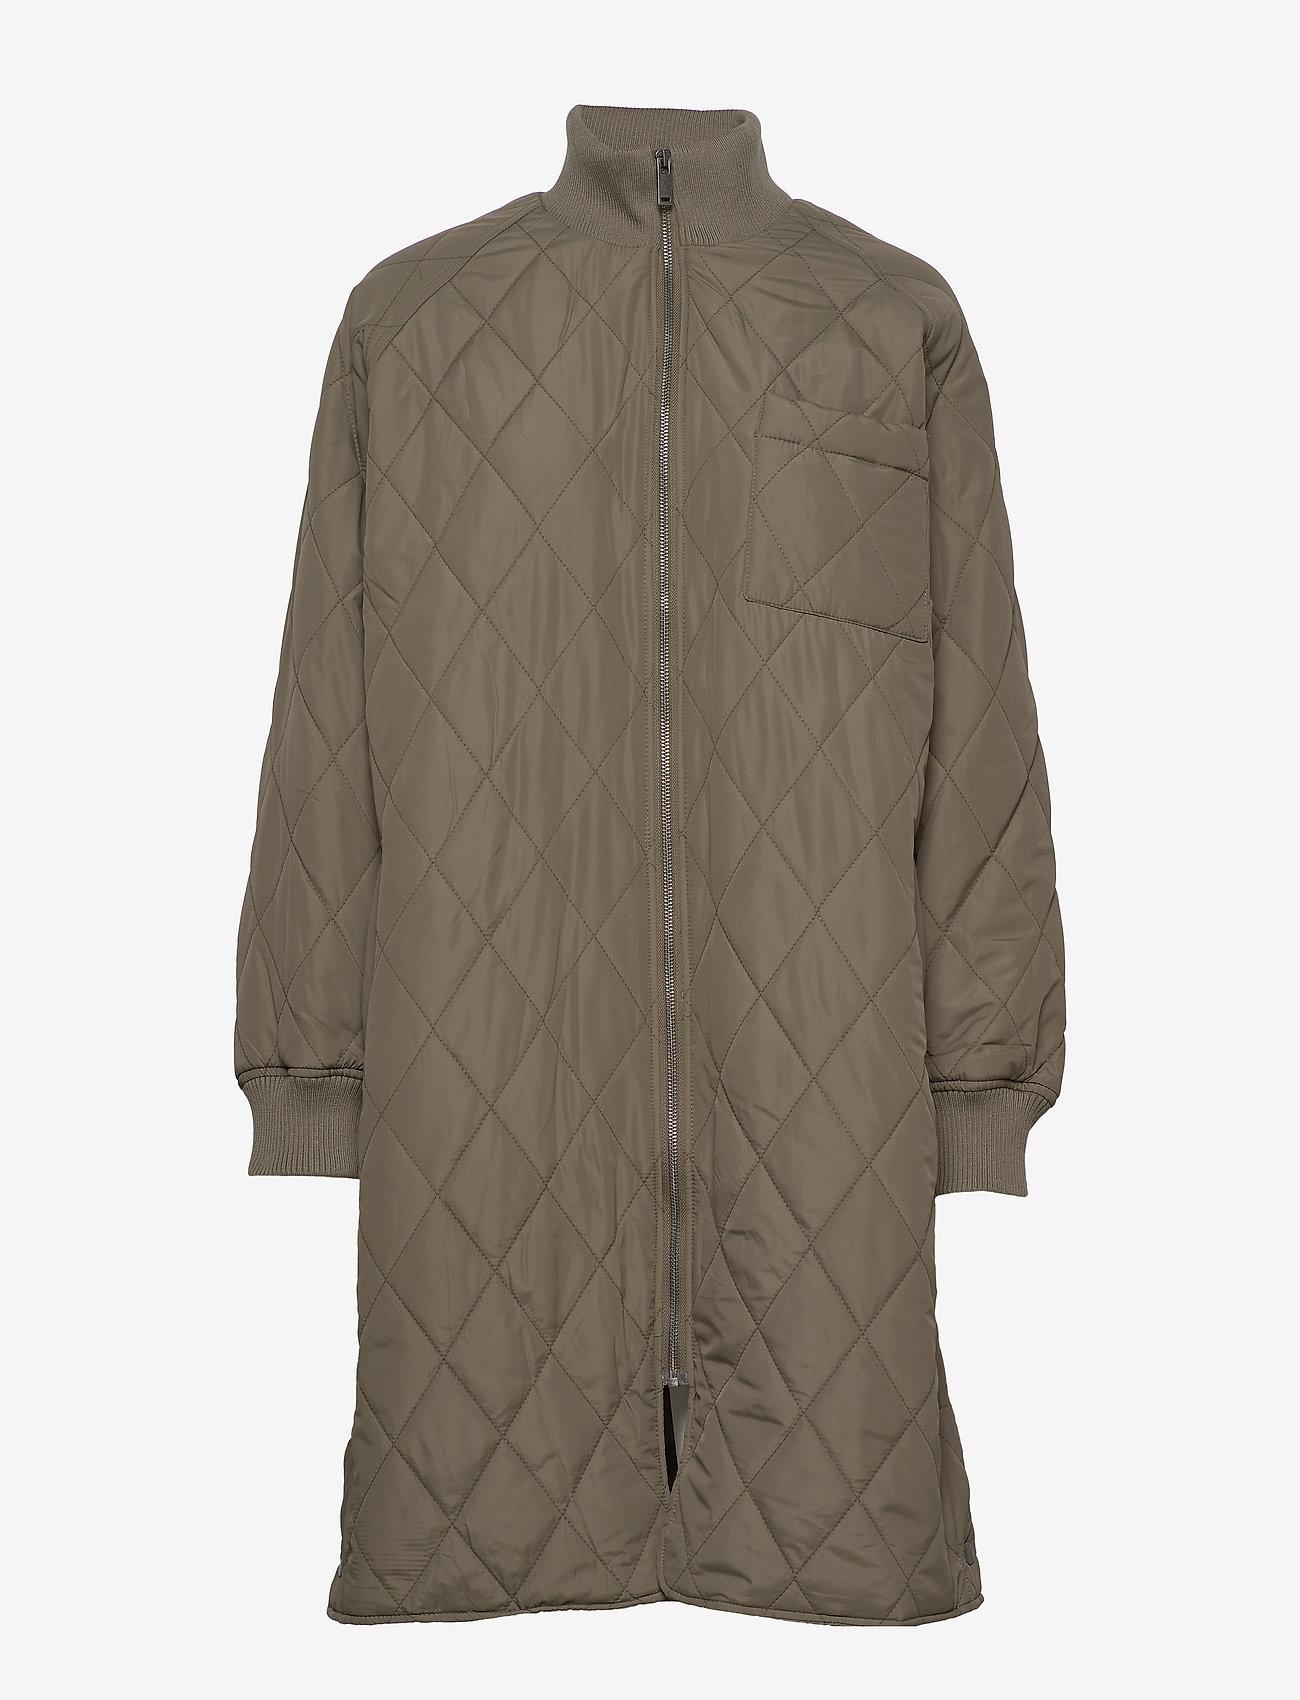 Ektraiw Quilted Coat (Beetle Green) - InWear F7LlI1